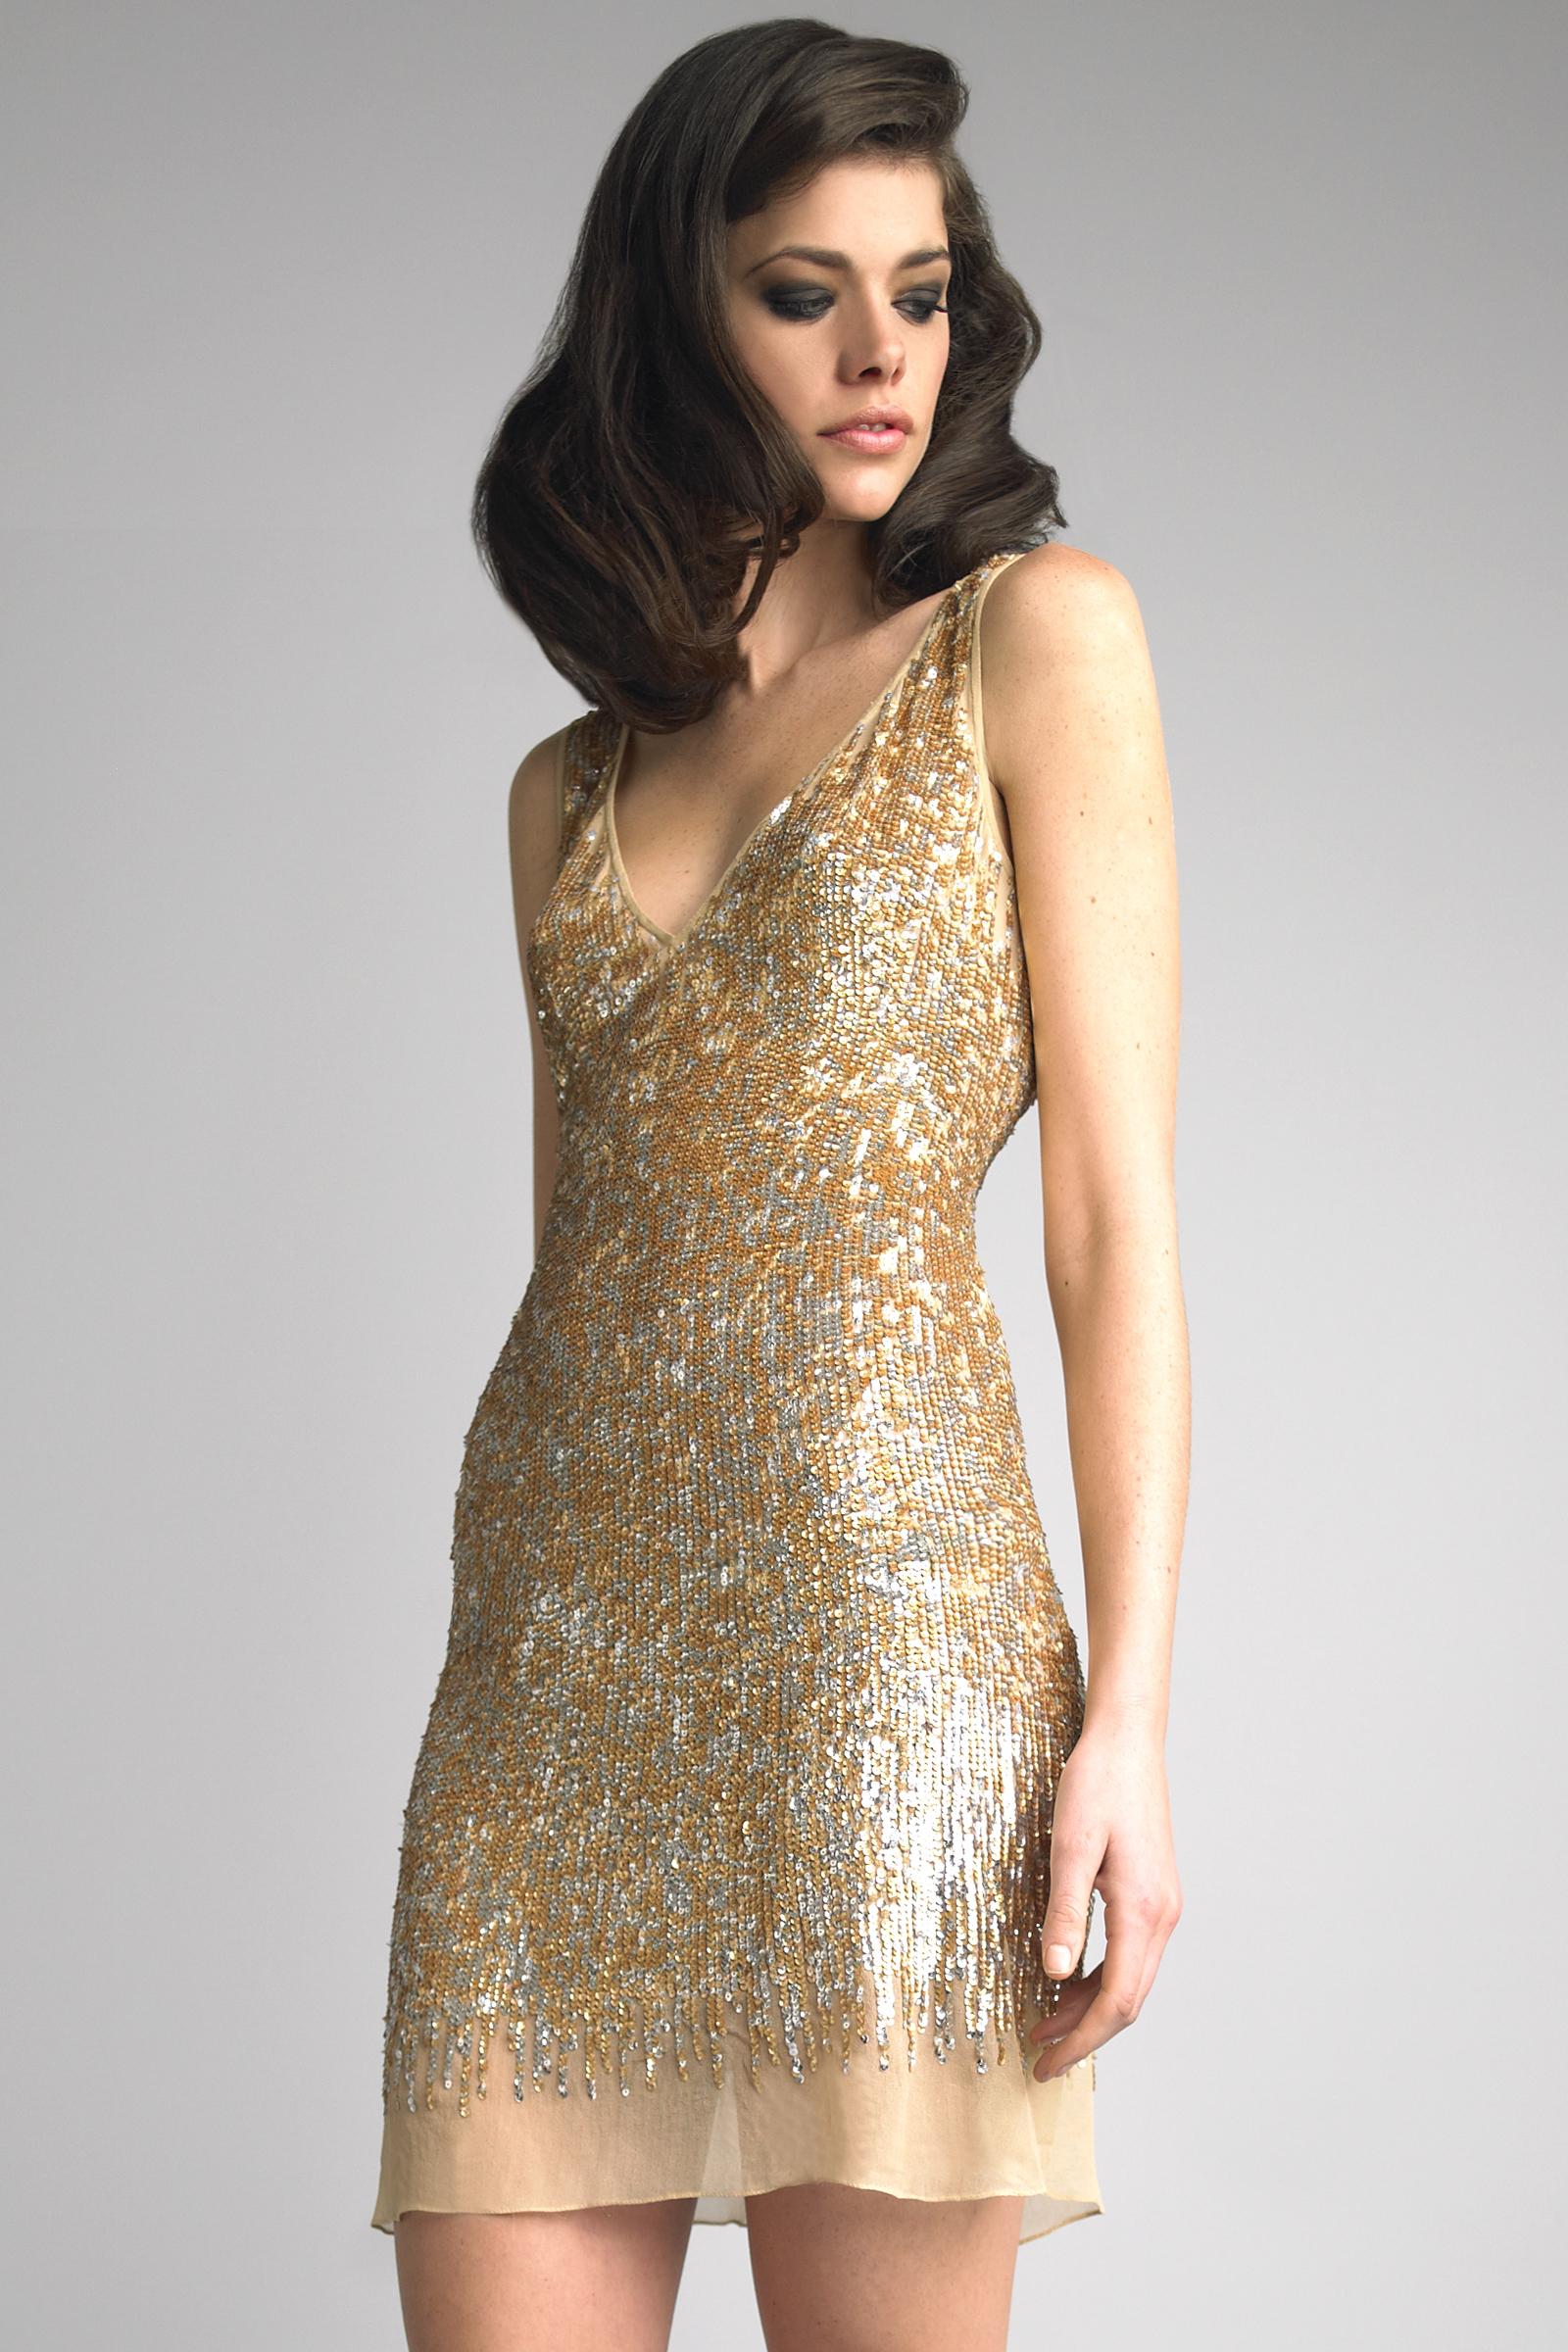 Women&-39-s Gold Sequin Tank Dress - Women&-39-s Fashion